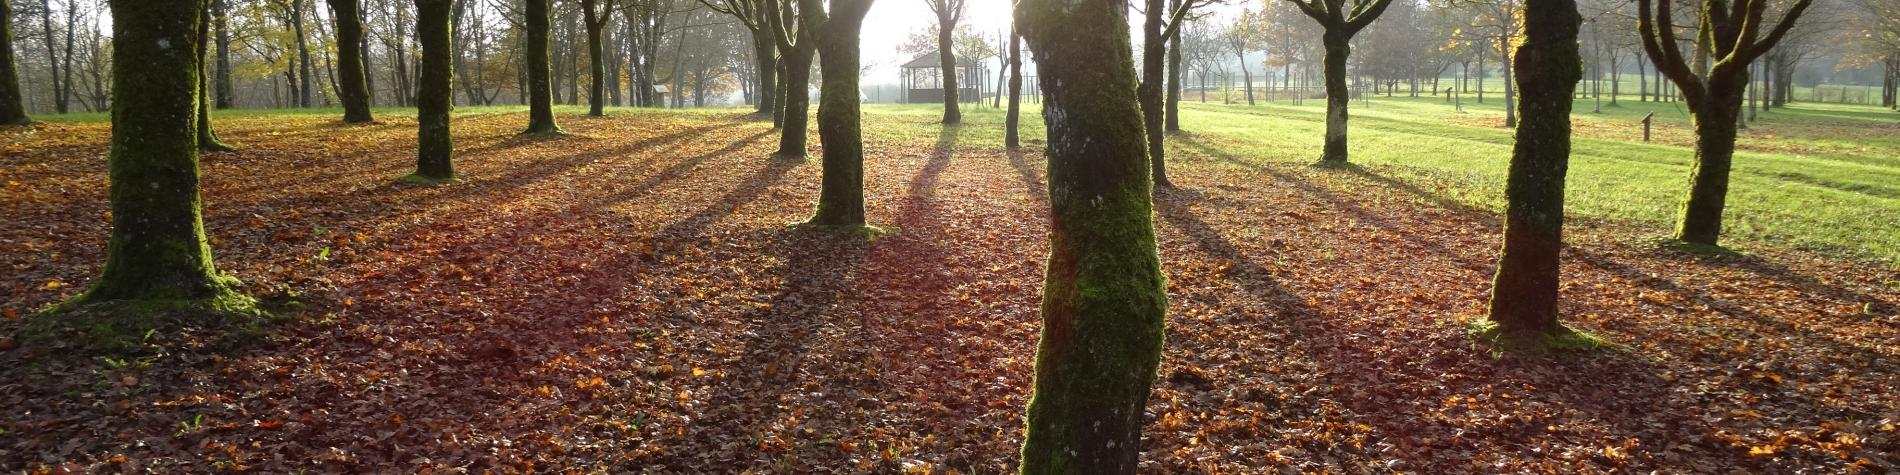 Tapis de feuilles mortes, soleil rasant et arbre en hiver